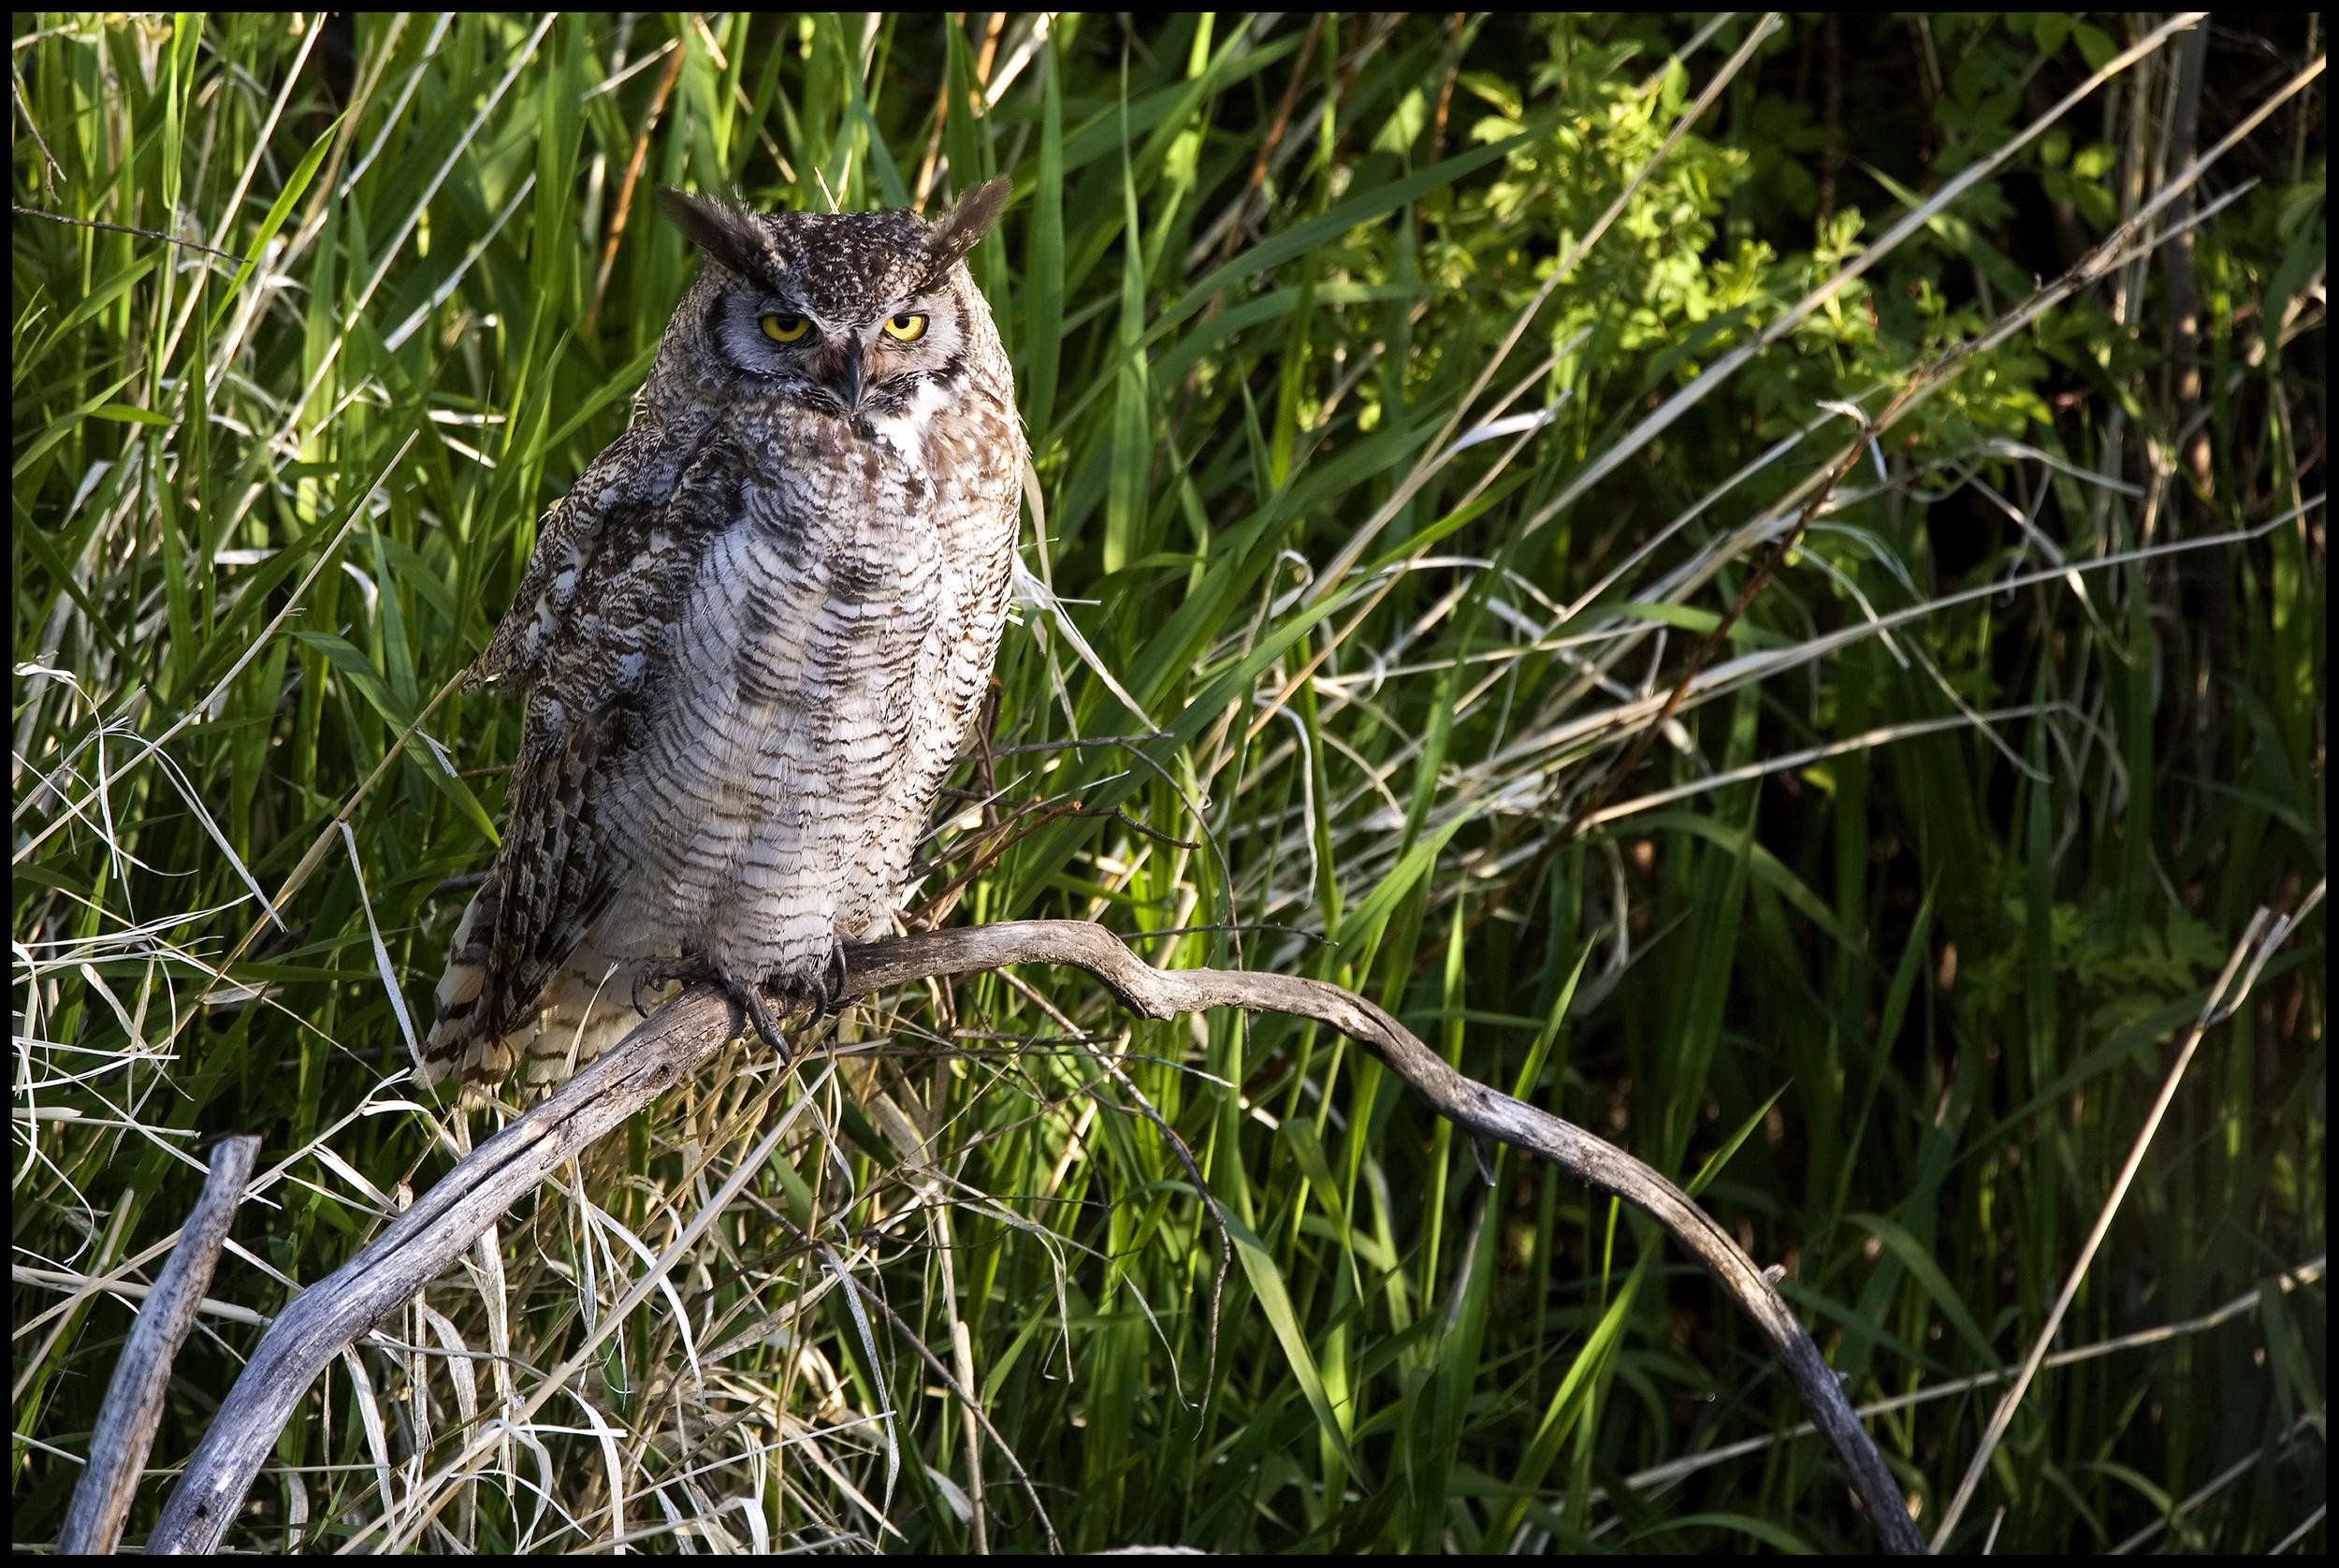 Great Horned Owl, Malheur National Wildlife Refuge, OR